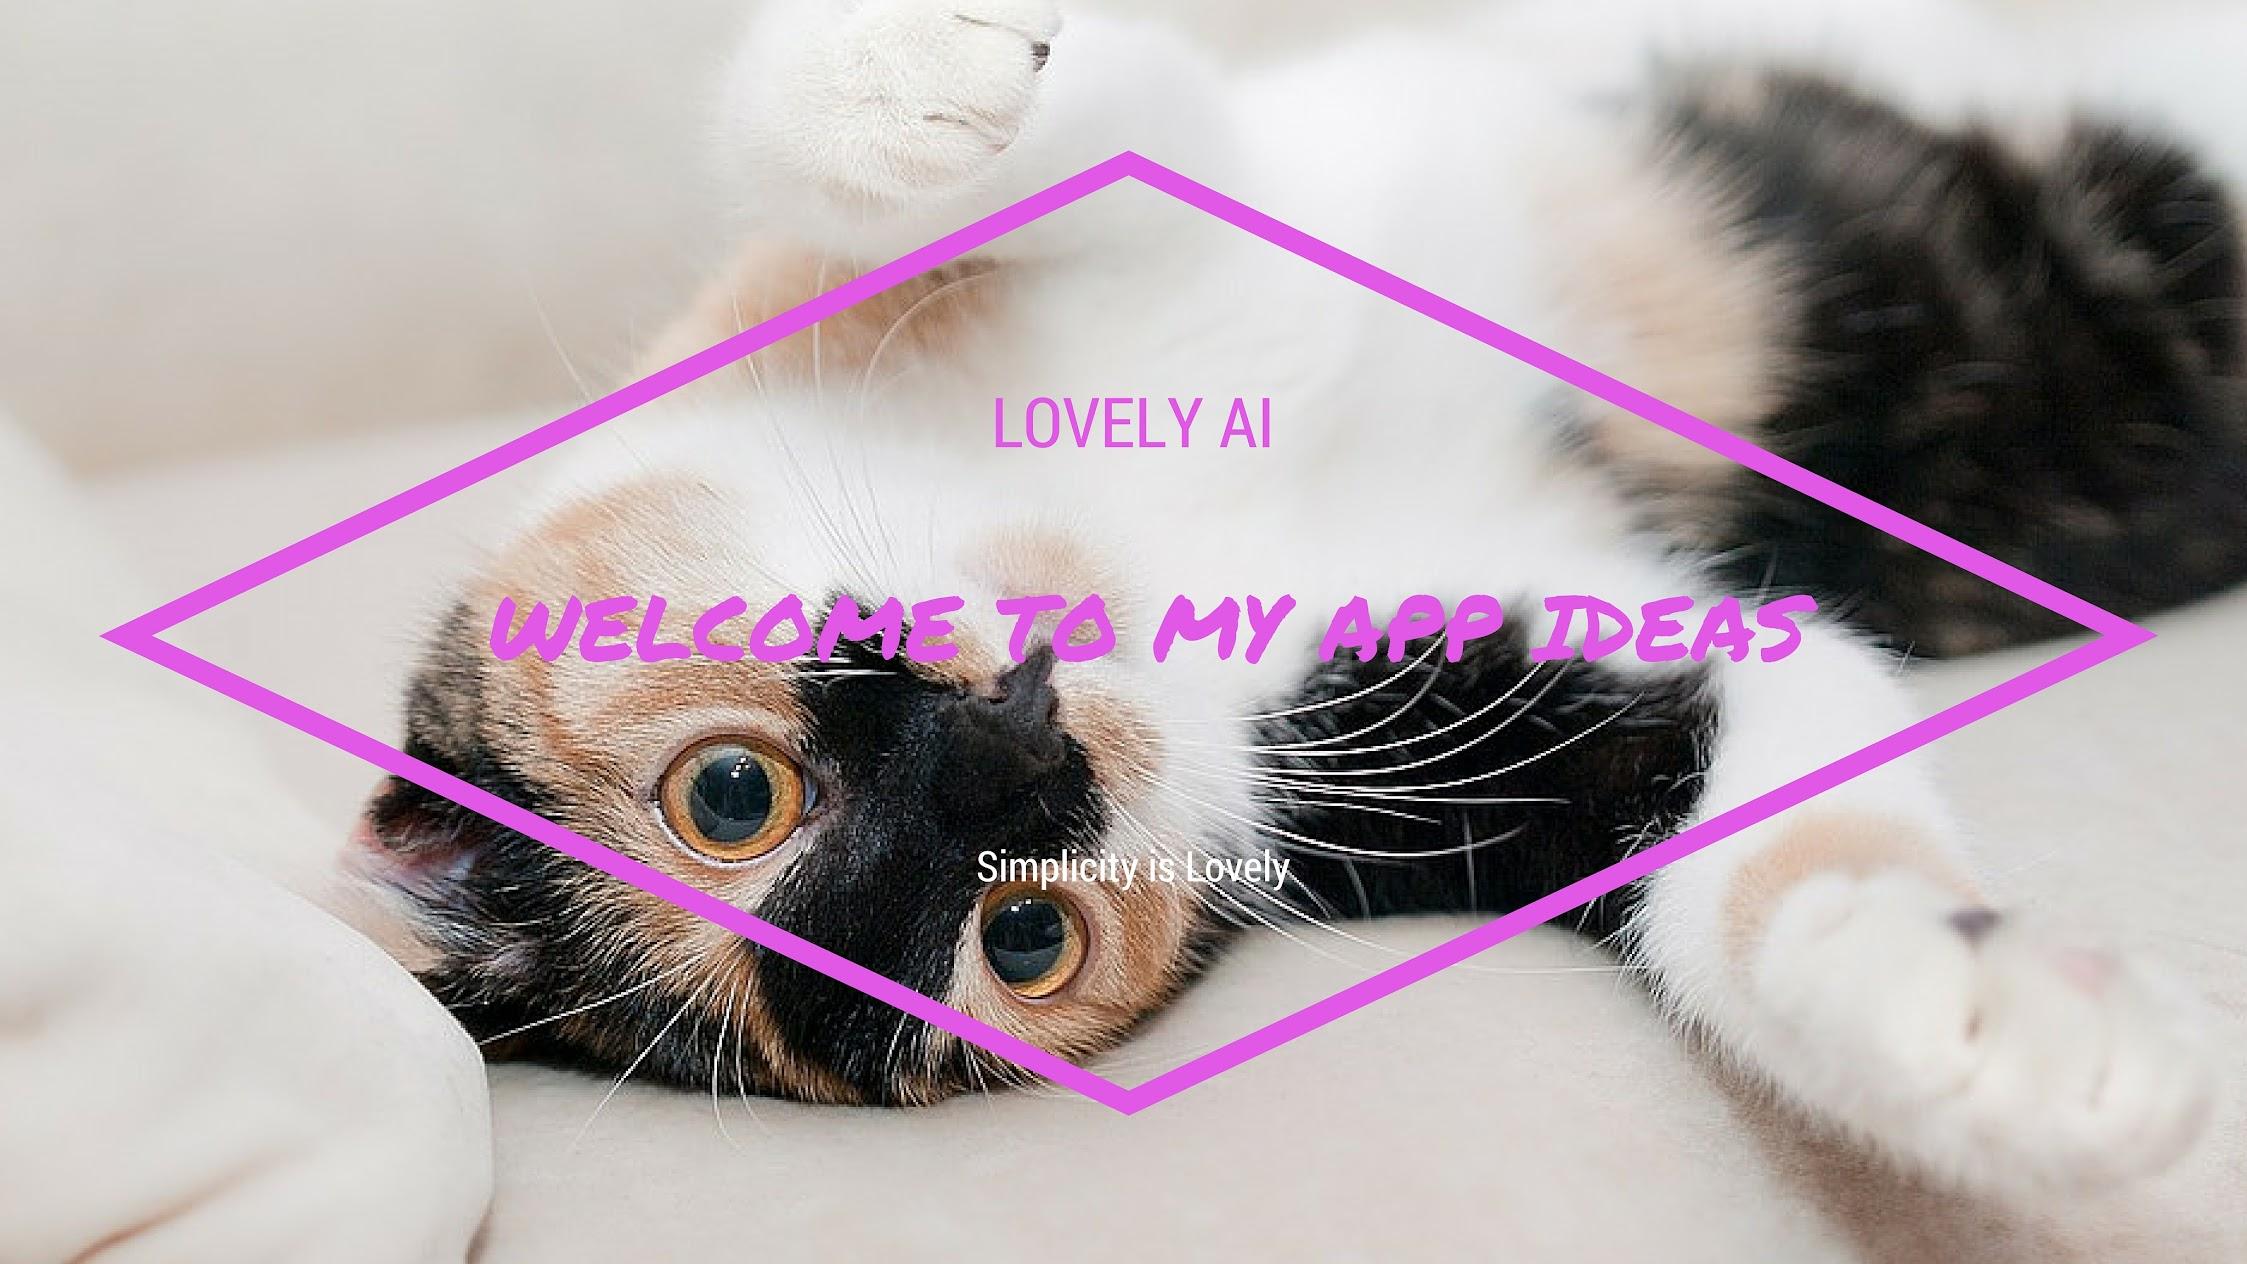 Lovely AI